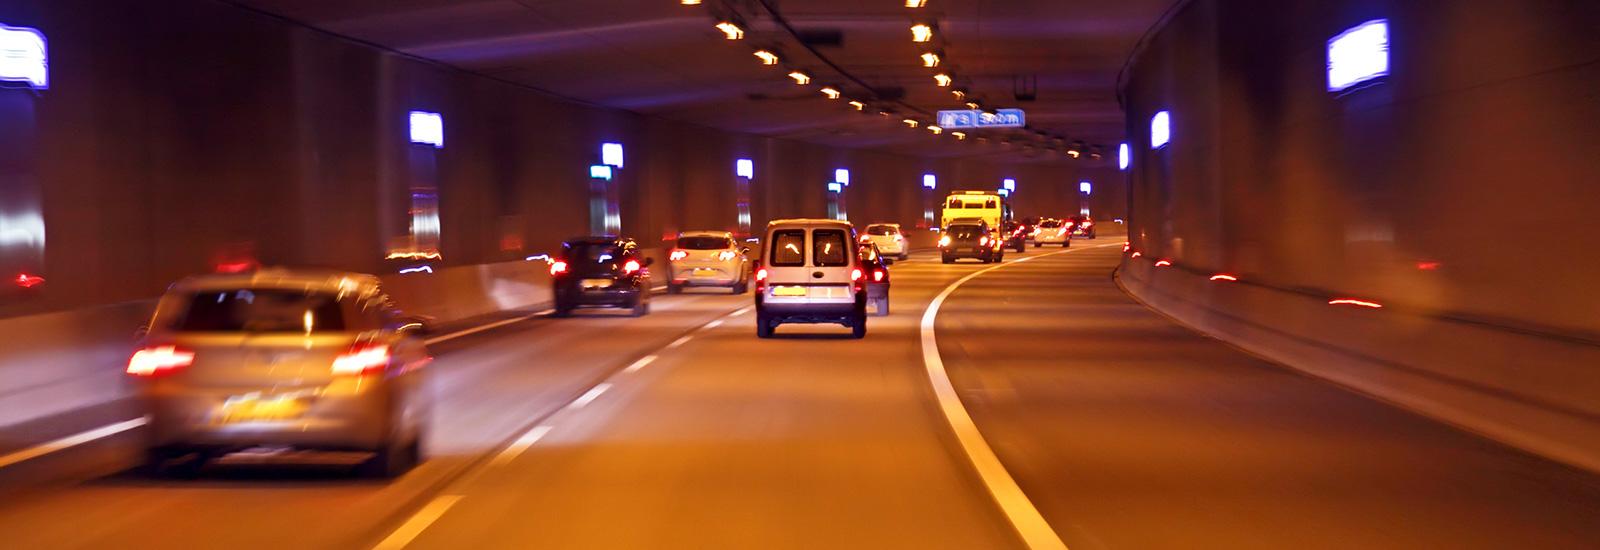 renuda-uk-slider-tunnel